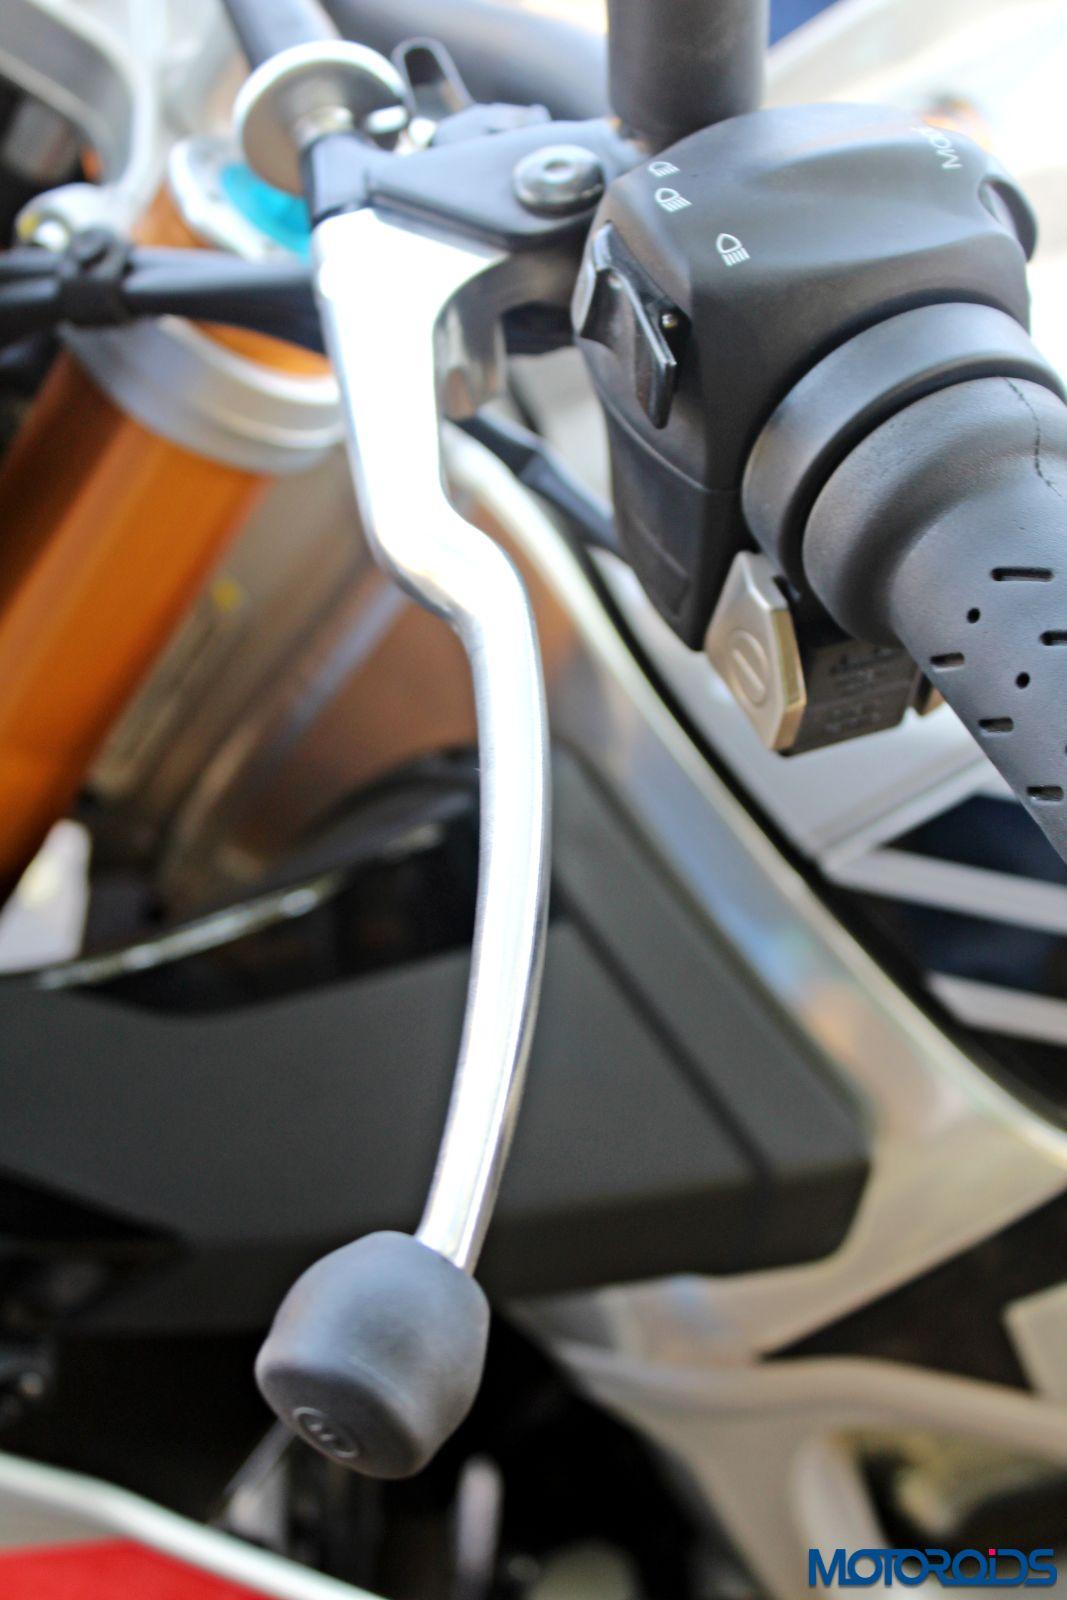 Aprilia Tuono V4 1100 Factory Review - Details and Stills (50)